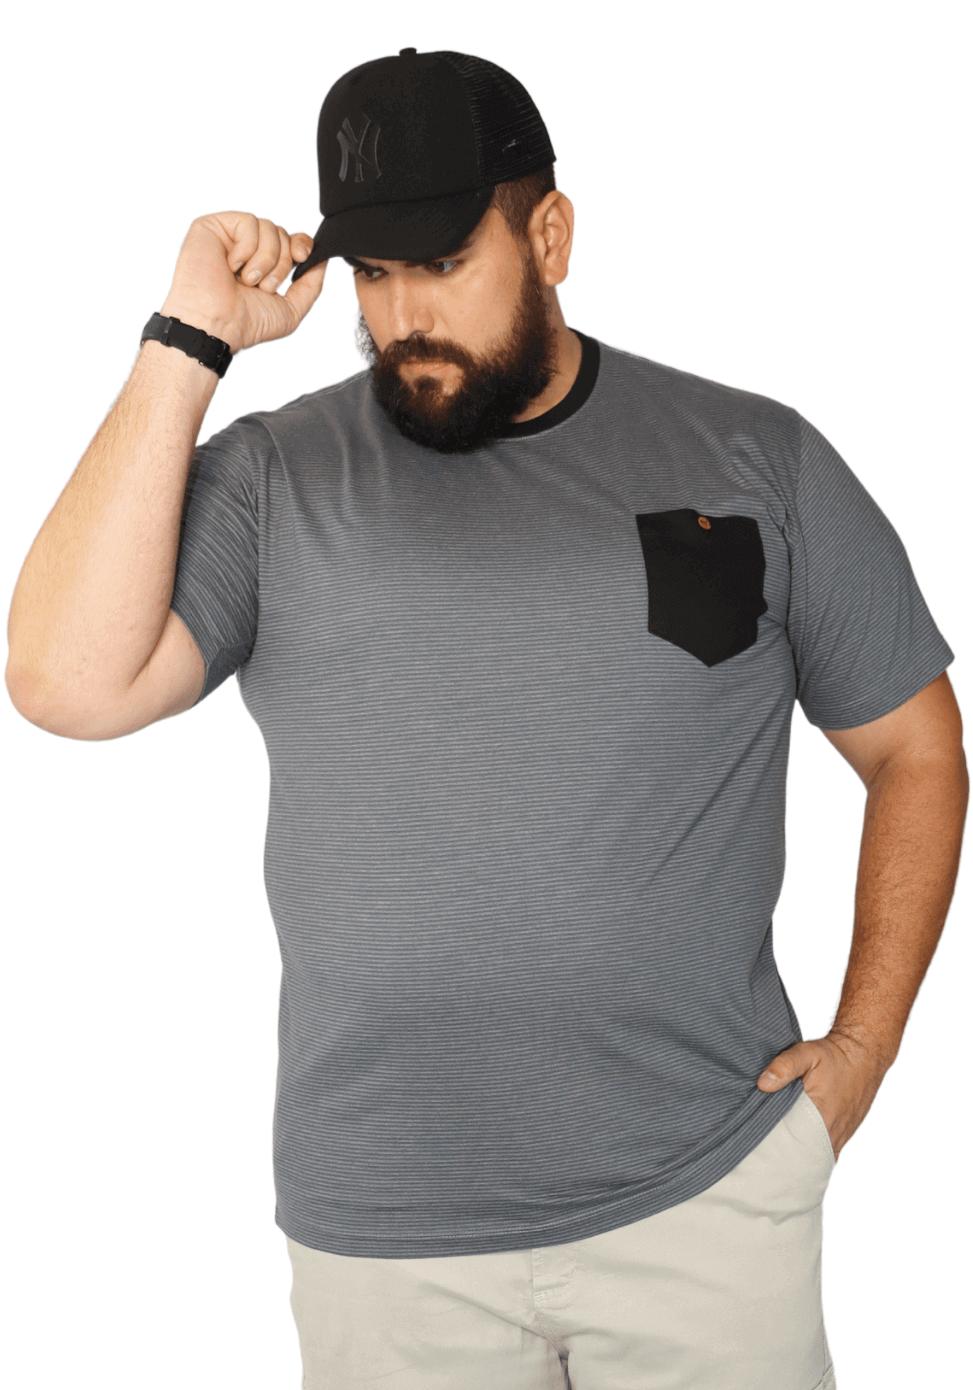 Camiseta Masculina Listrada com Bolso Plus Size